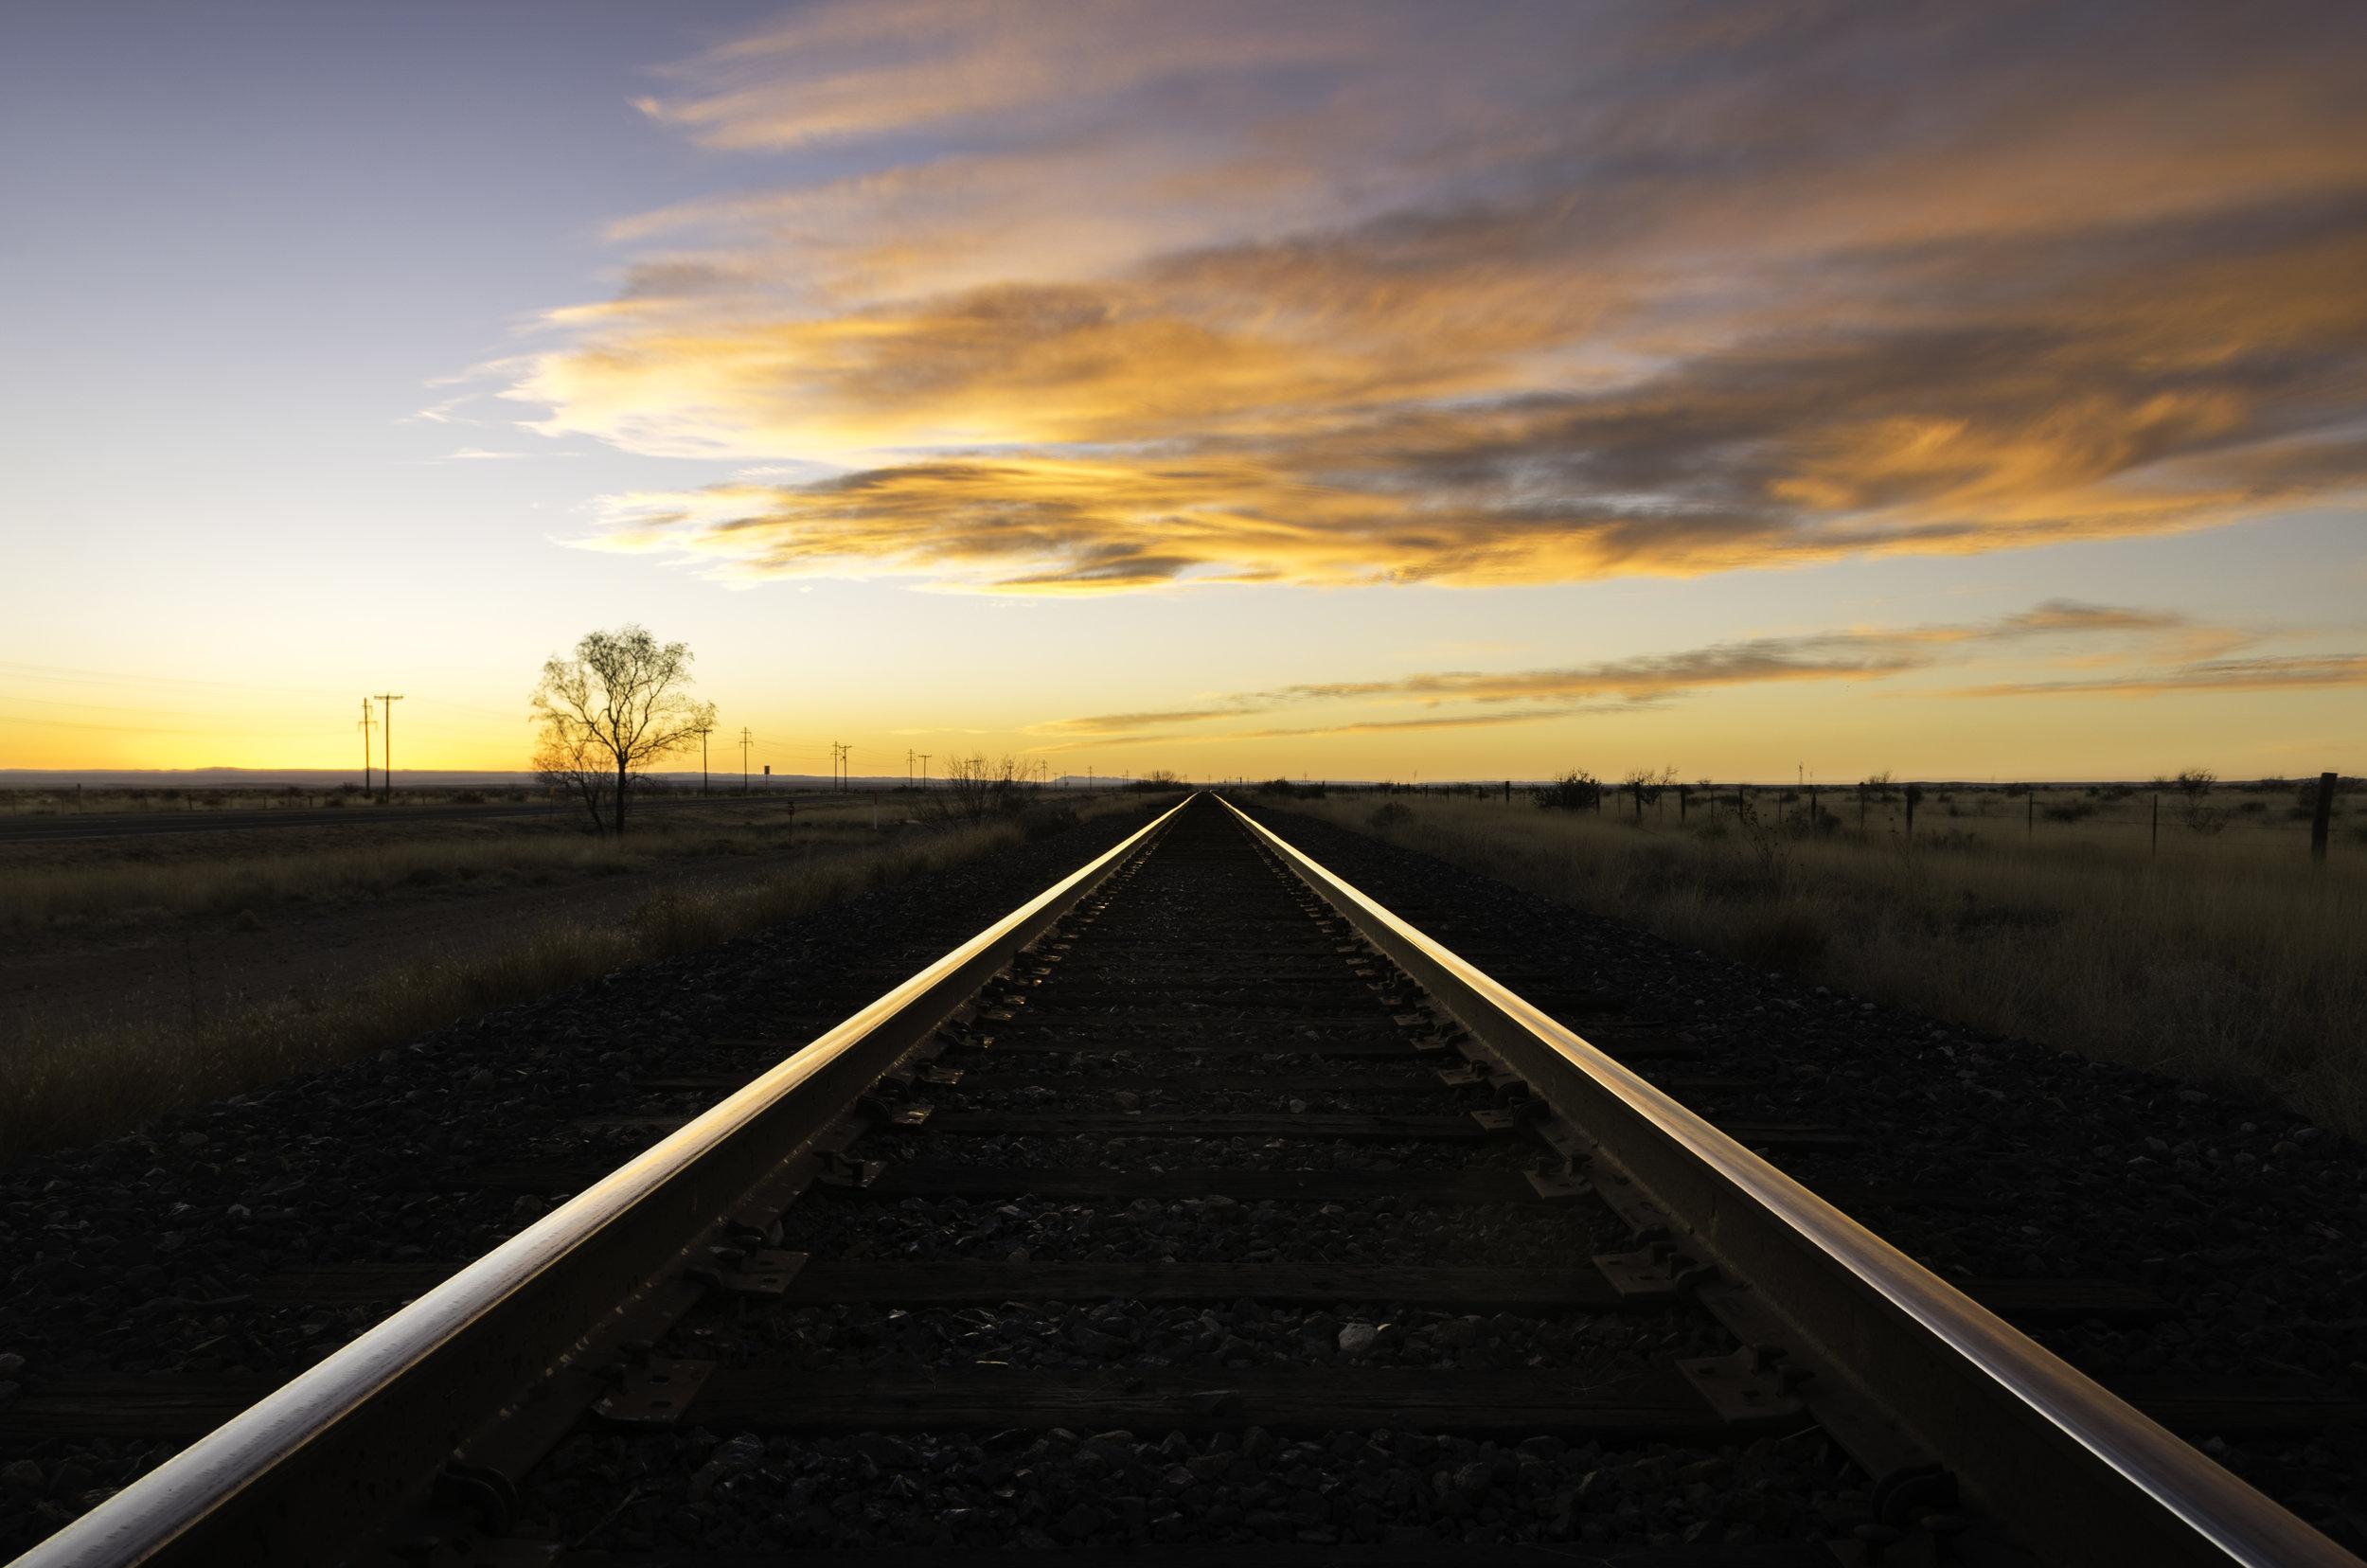 Railroad Tracks Sunset.jpg